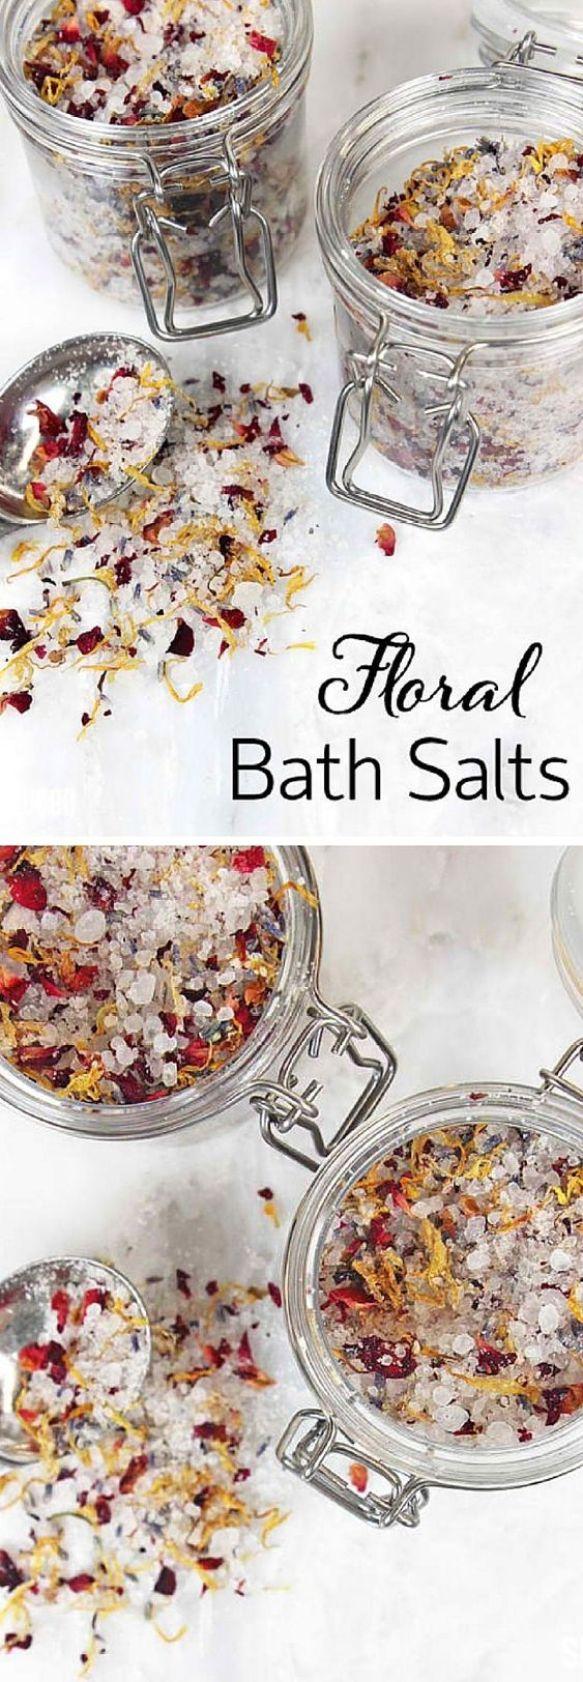 Floral Bath Salts